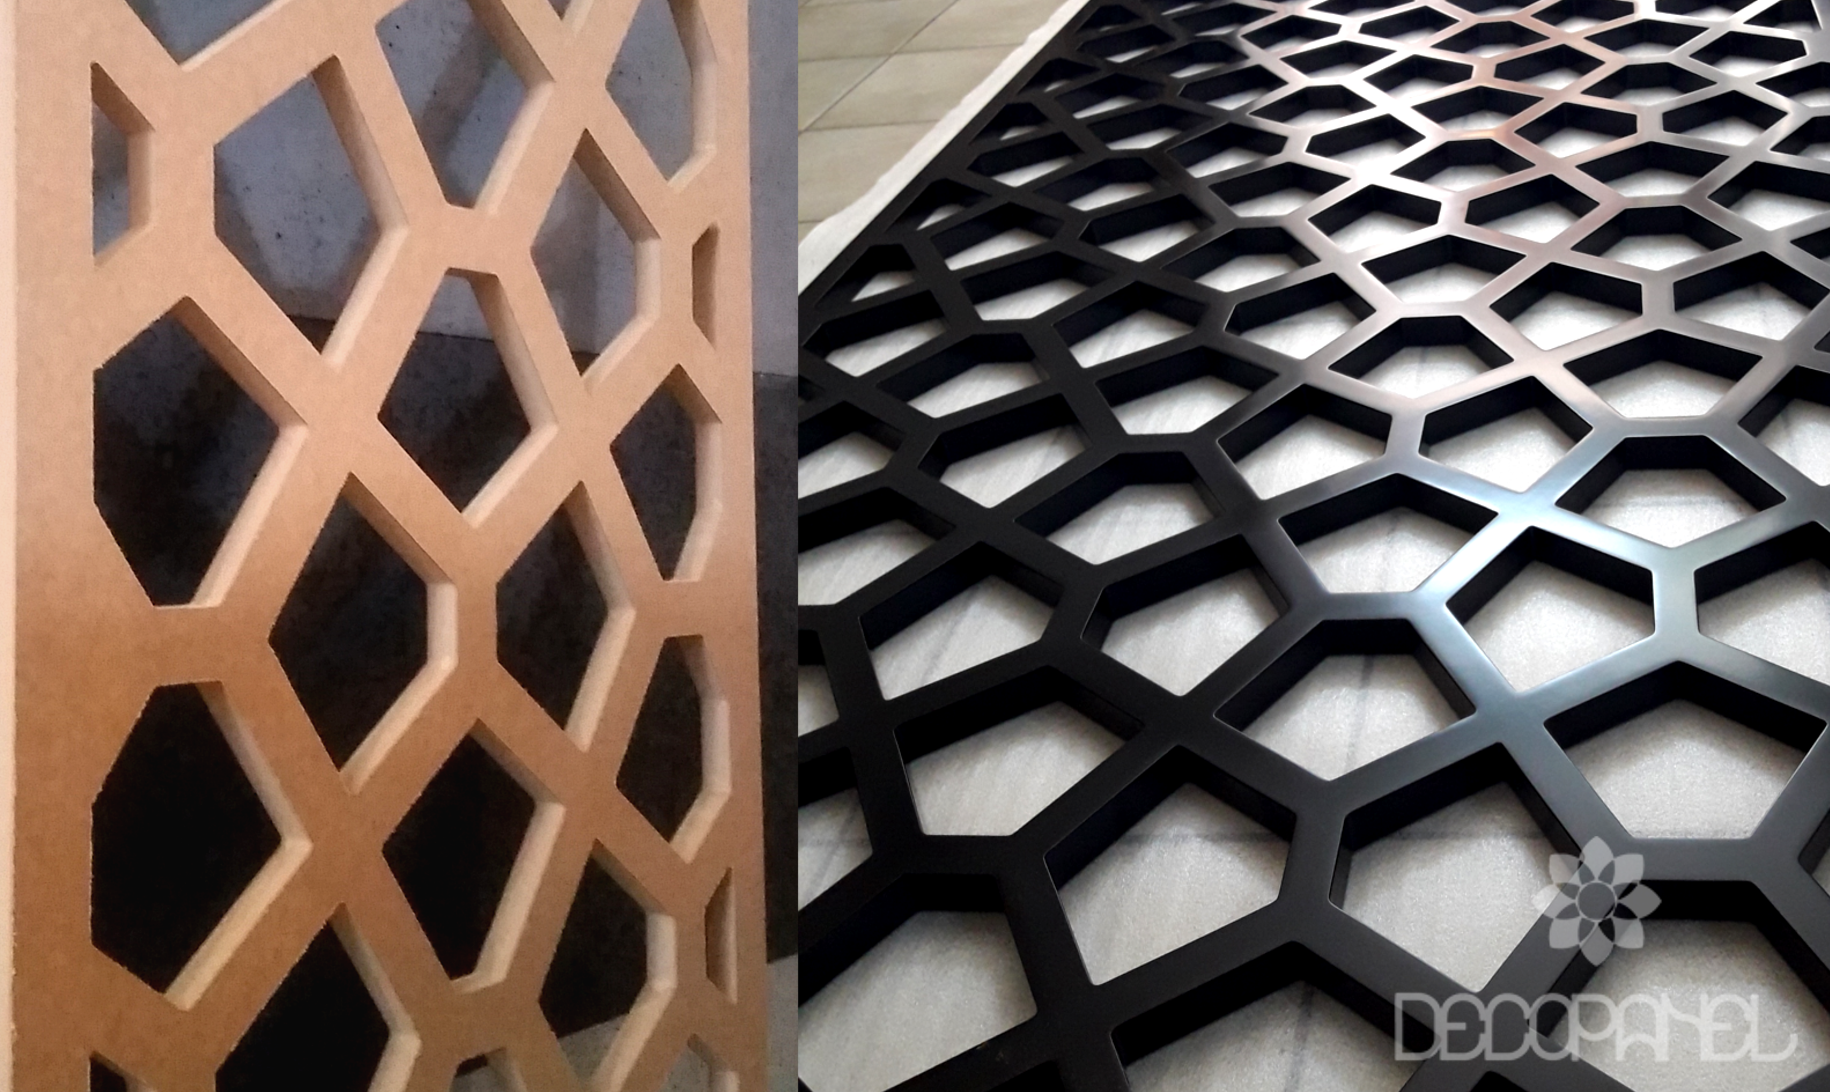 Lakierowane Dekoracyjne Panele Ażurowe 3d Decopanel